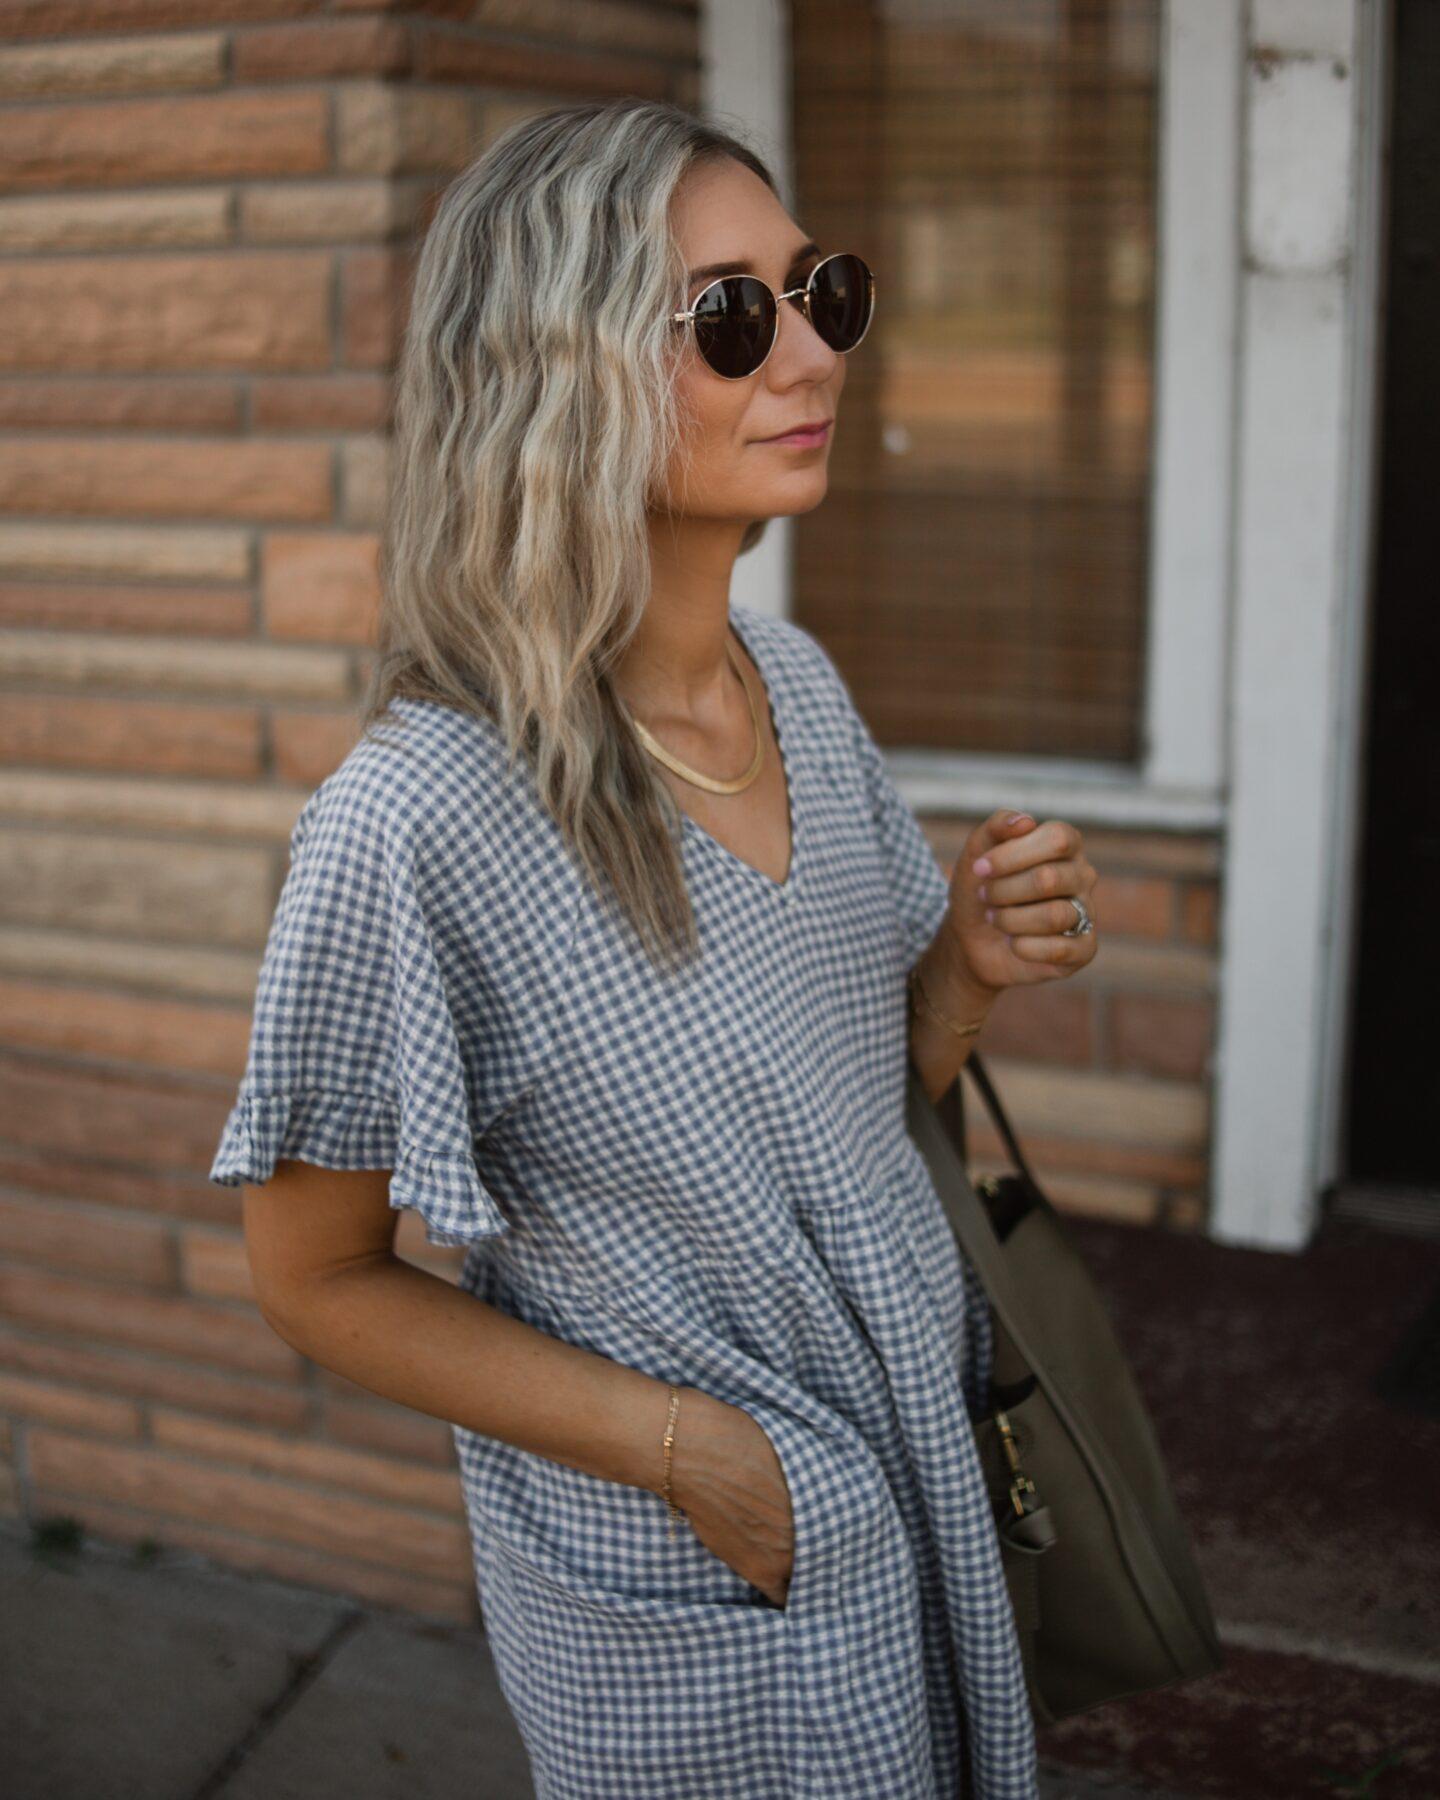 madewell ruffle sleeve babydoll dress, madewell sidewalk low top sneakers, madewell sydney shoulder bag review